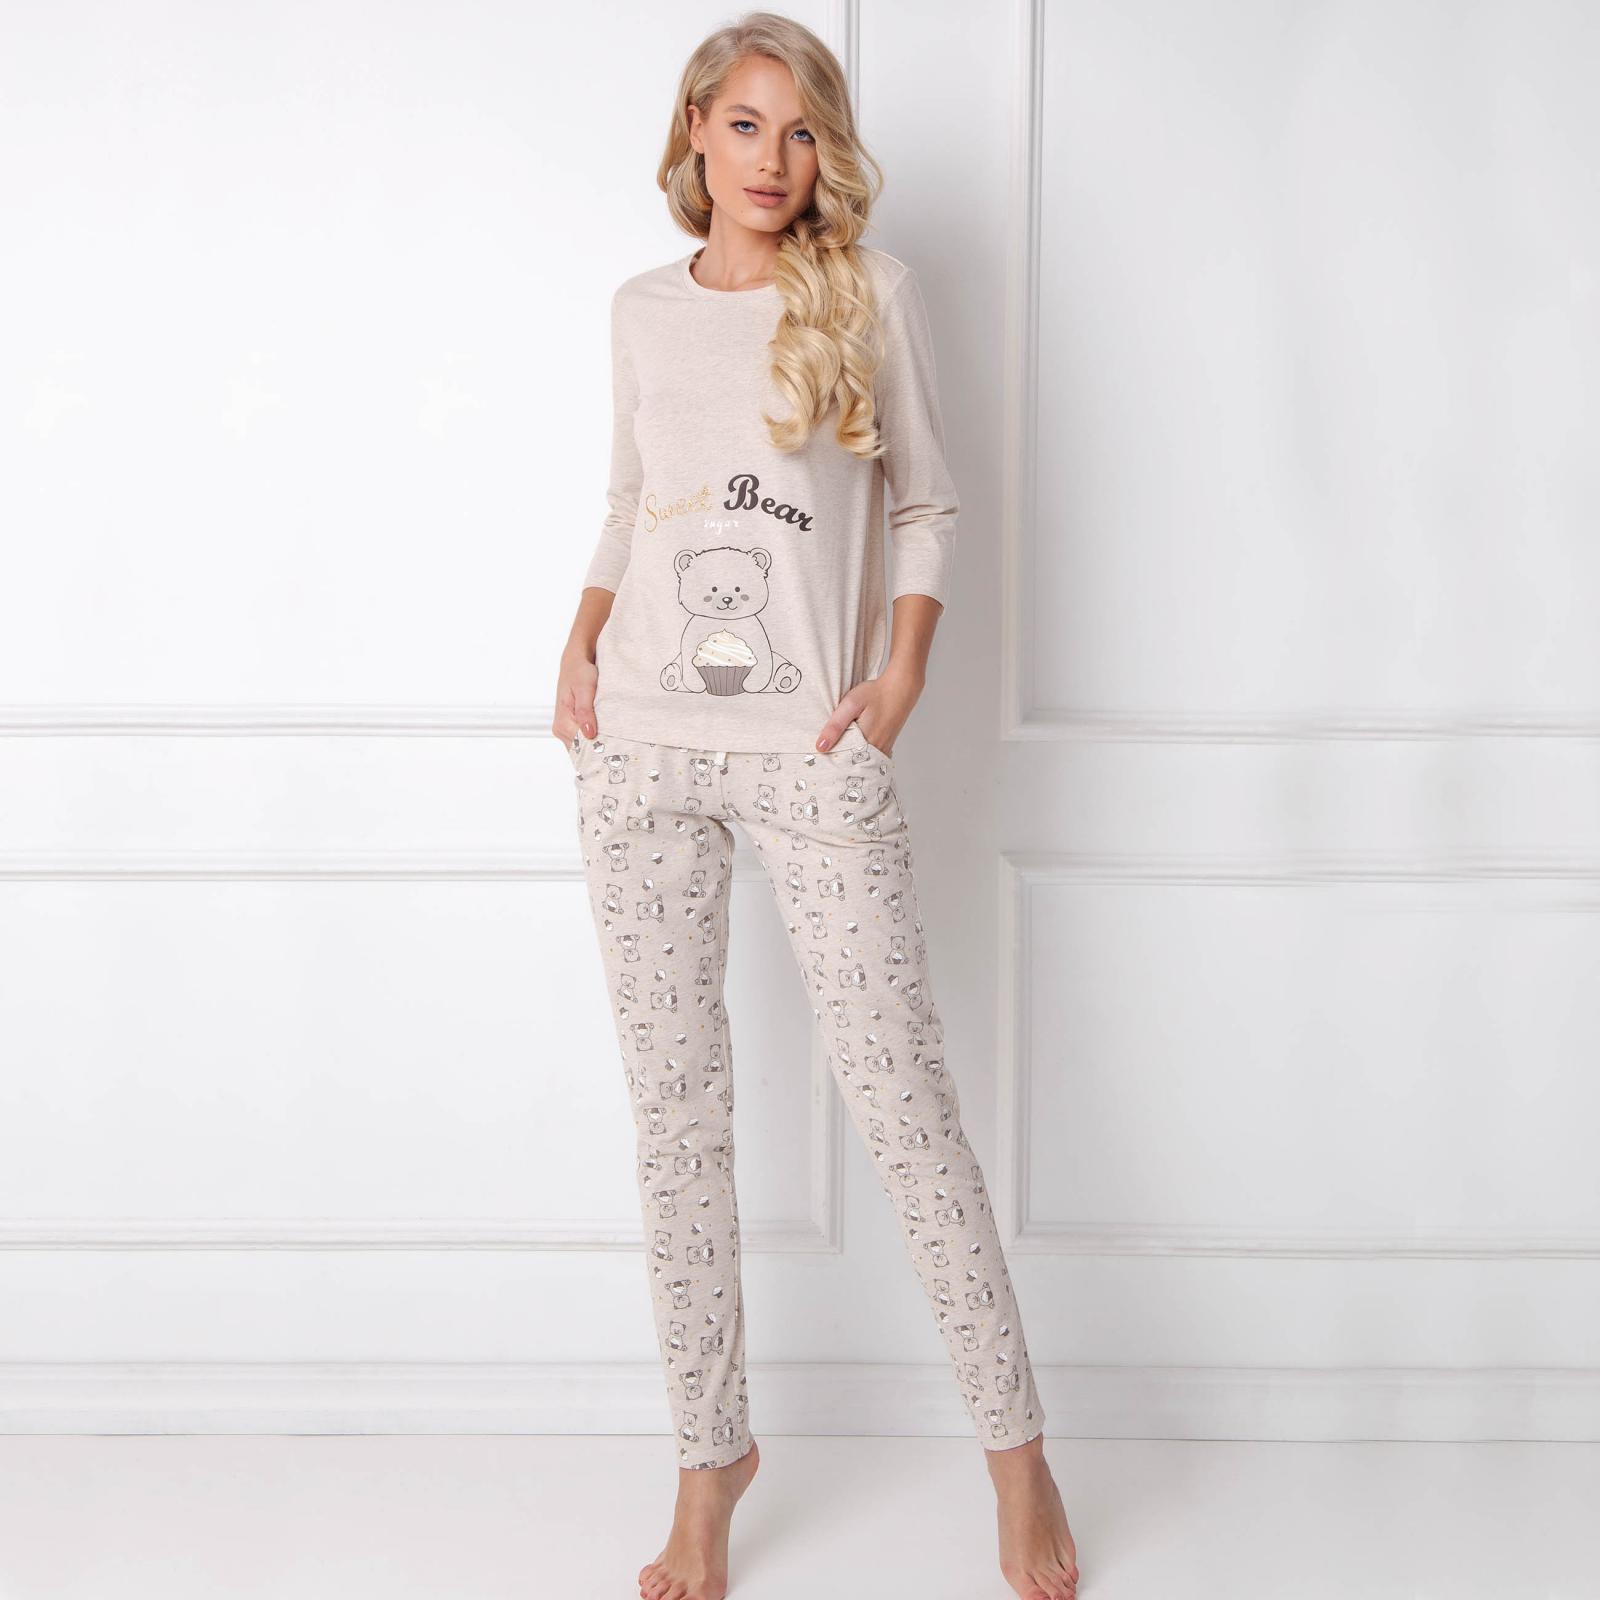 Pijamale dama Sweet Bear 2 piese, pantaloni lungi